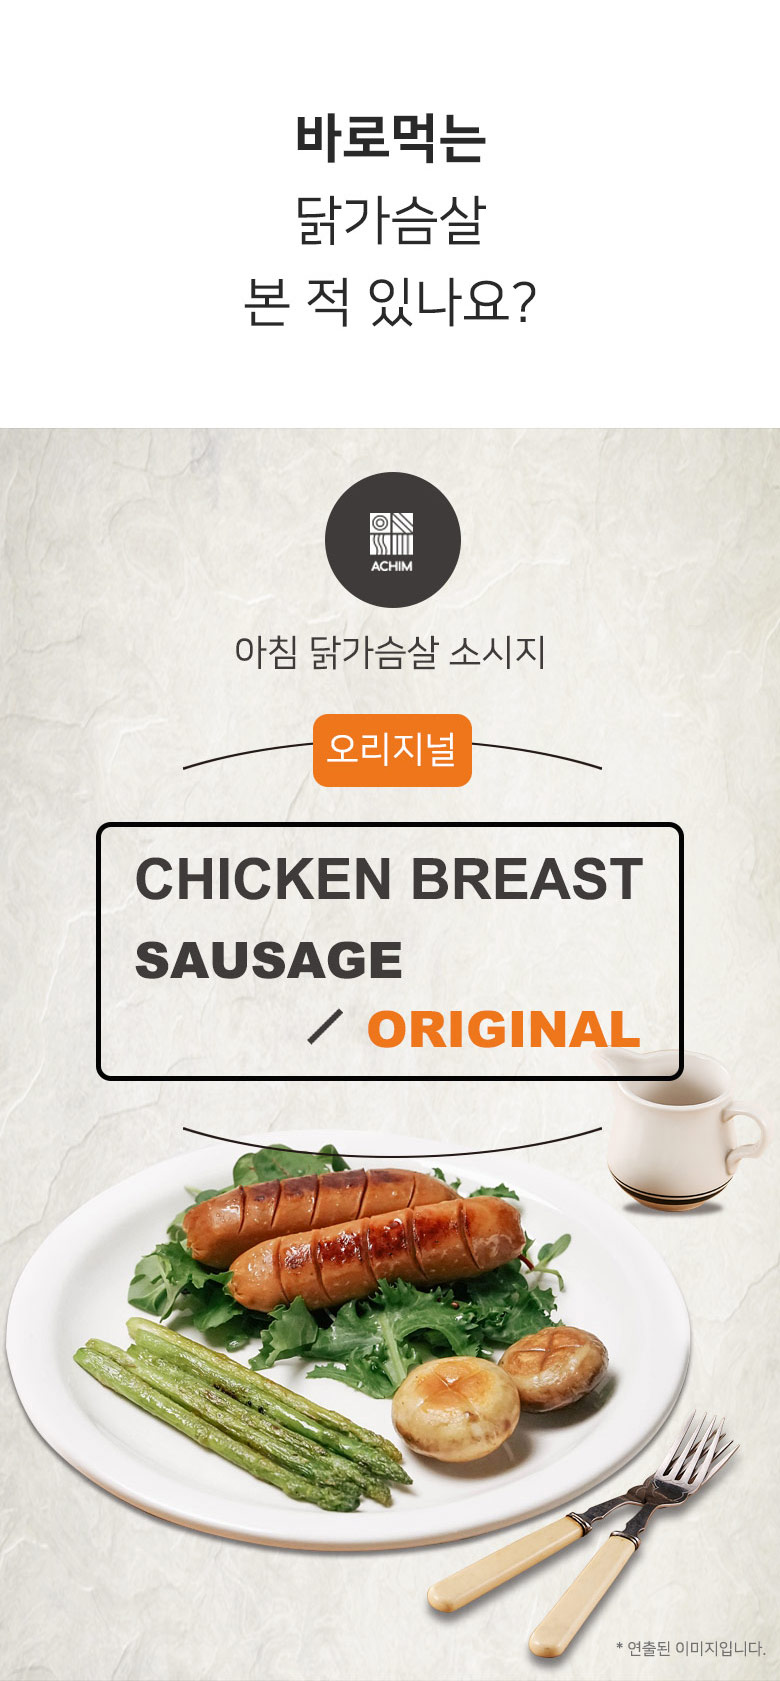 achim_sausage_original02_shop1_114419.jpg